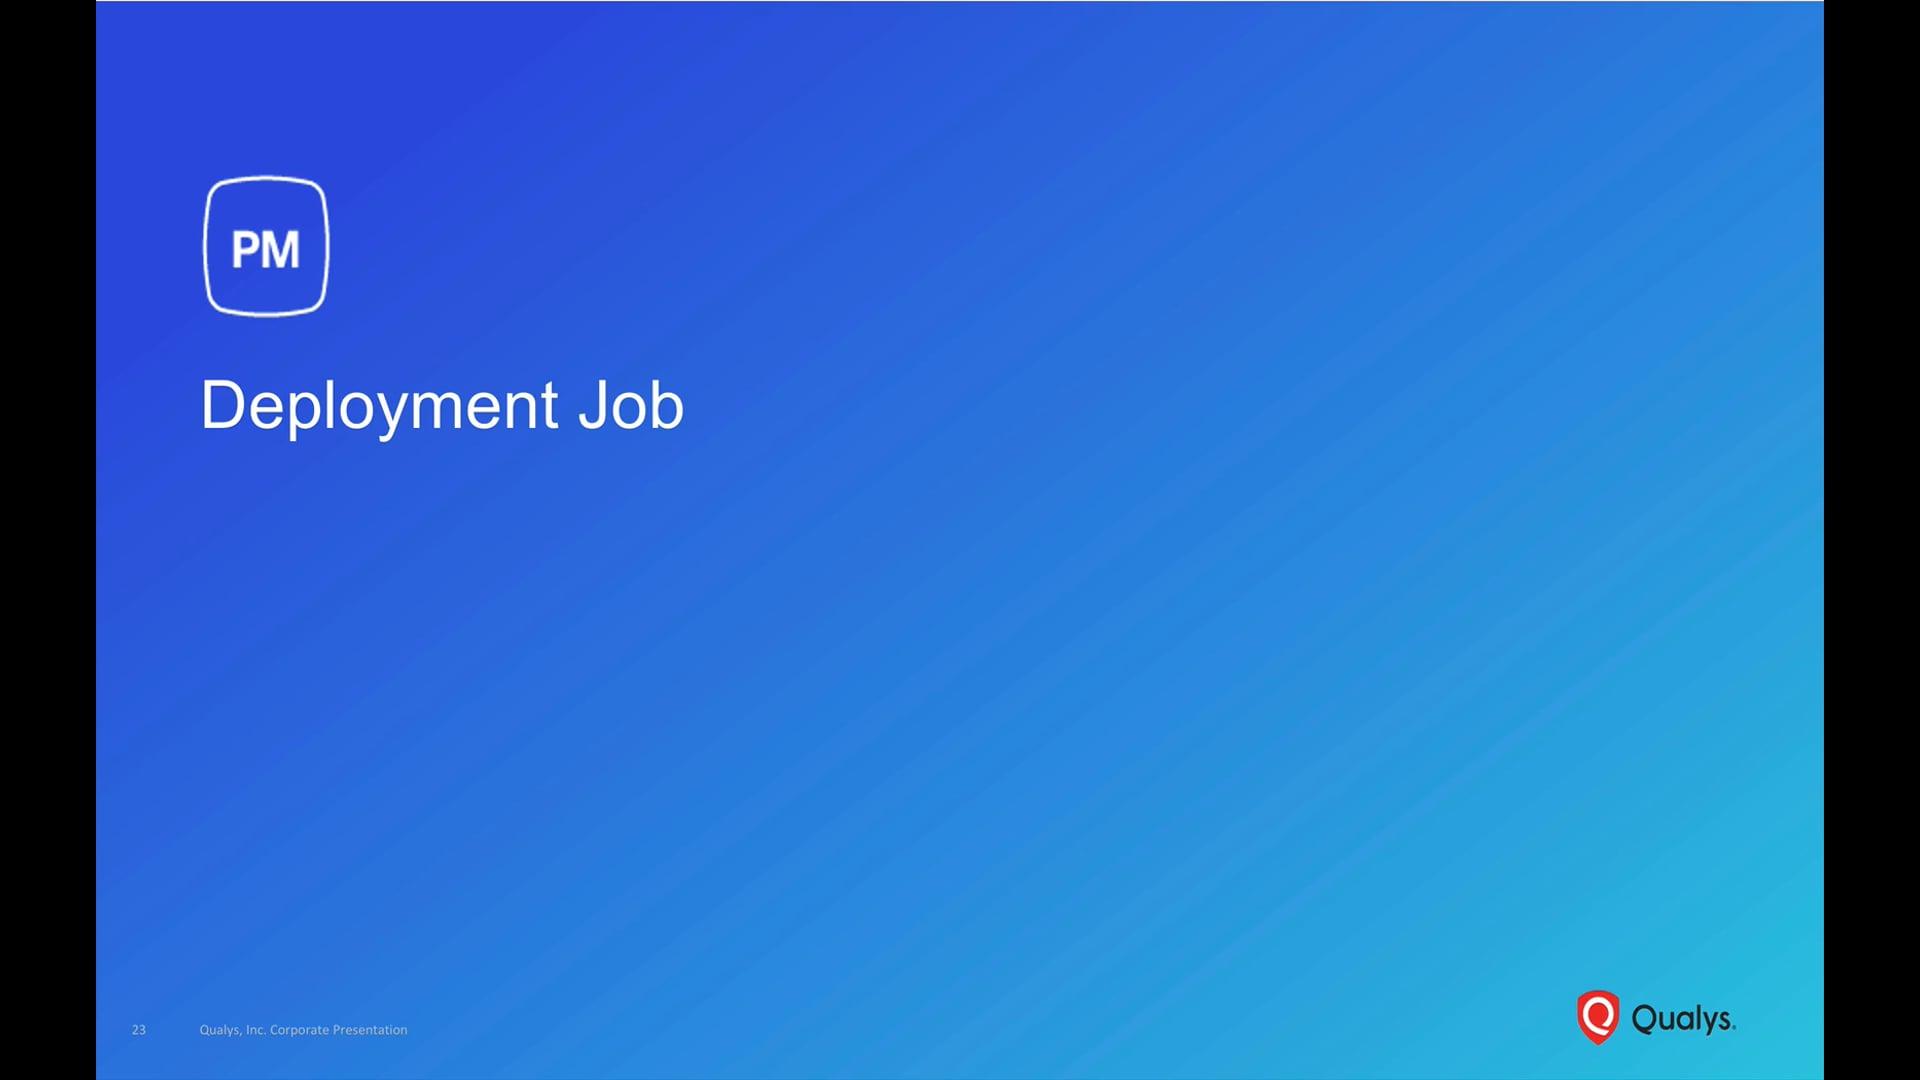 PM Deployment Job